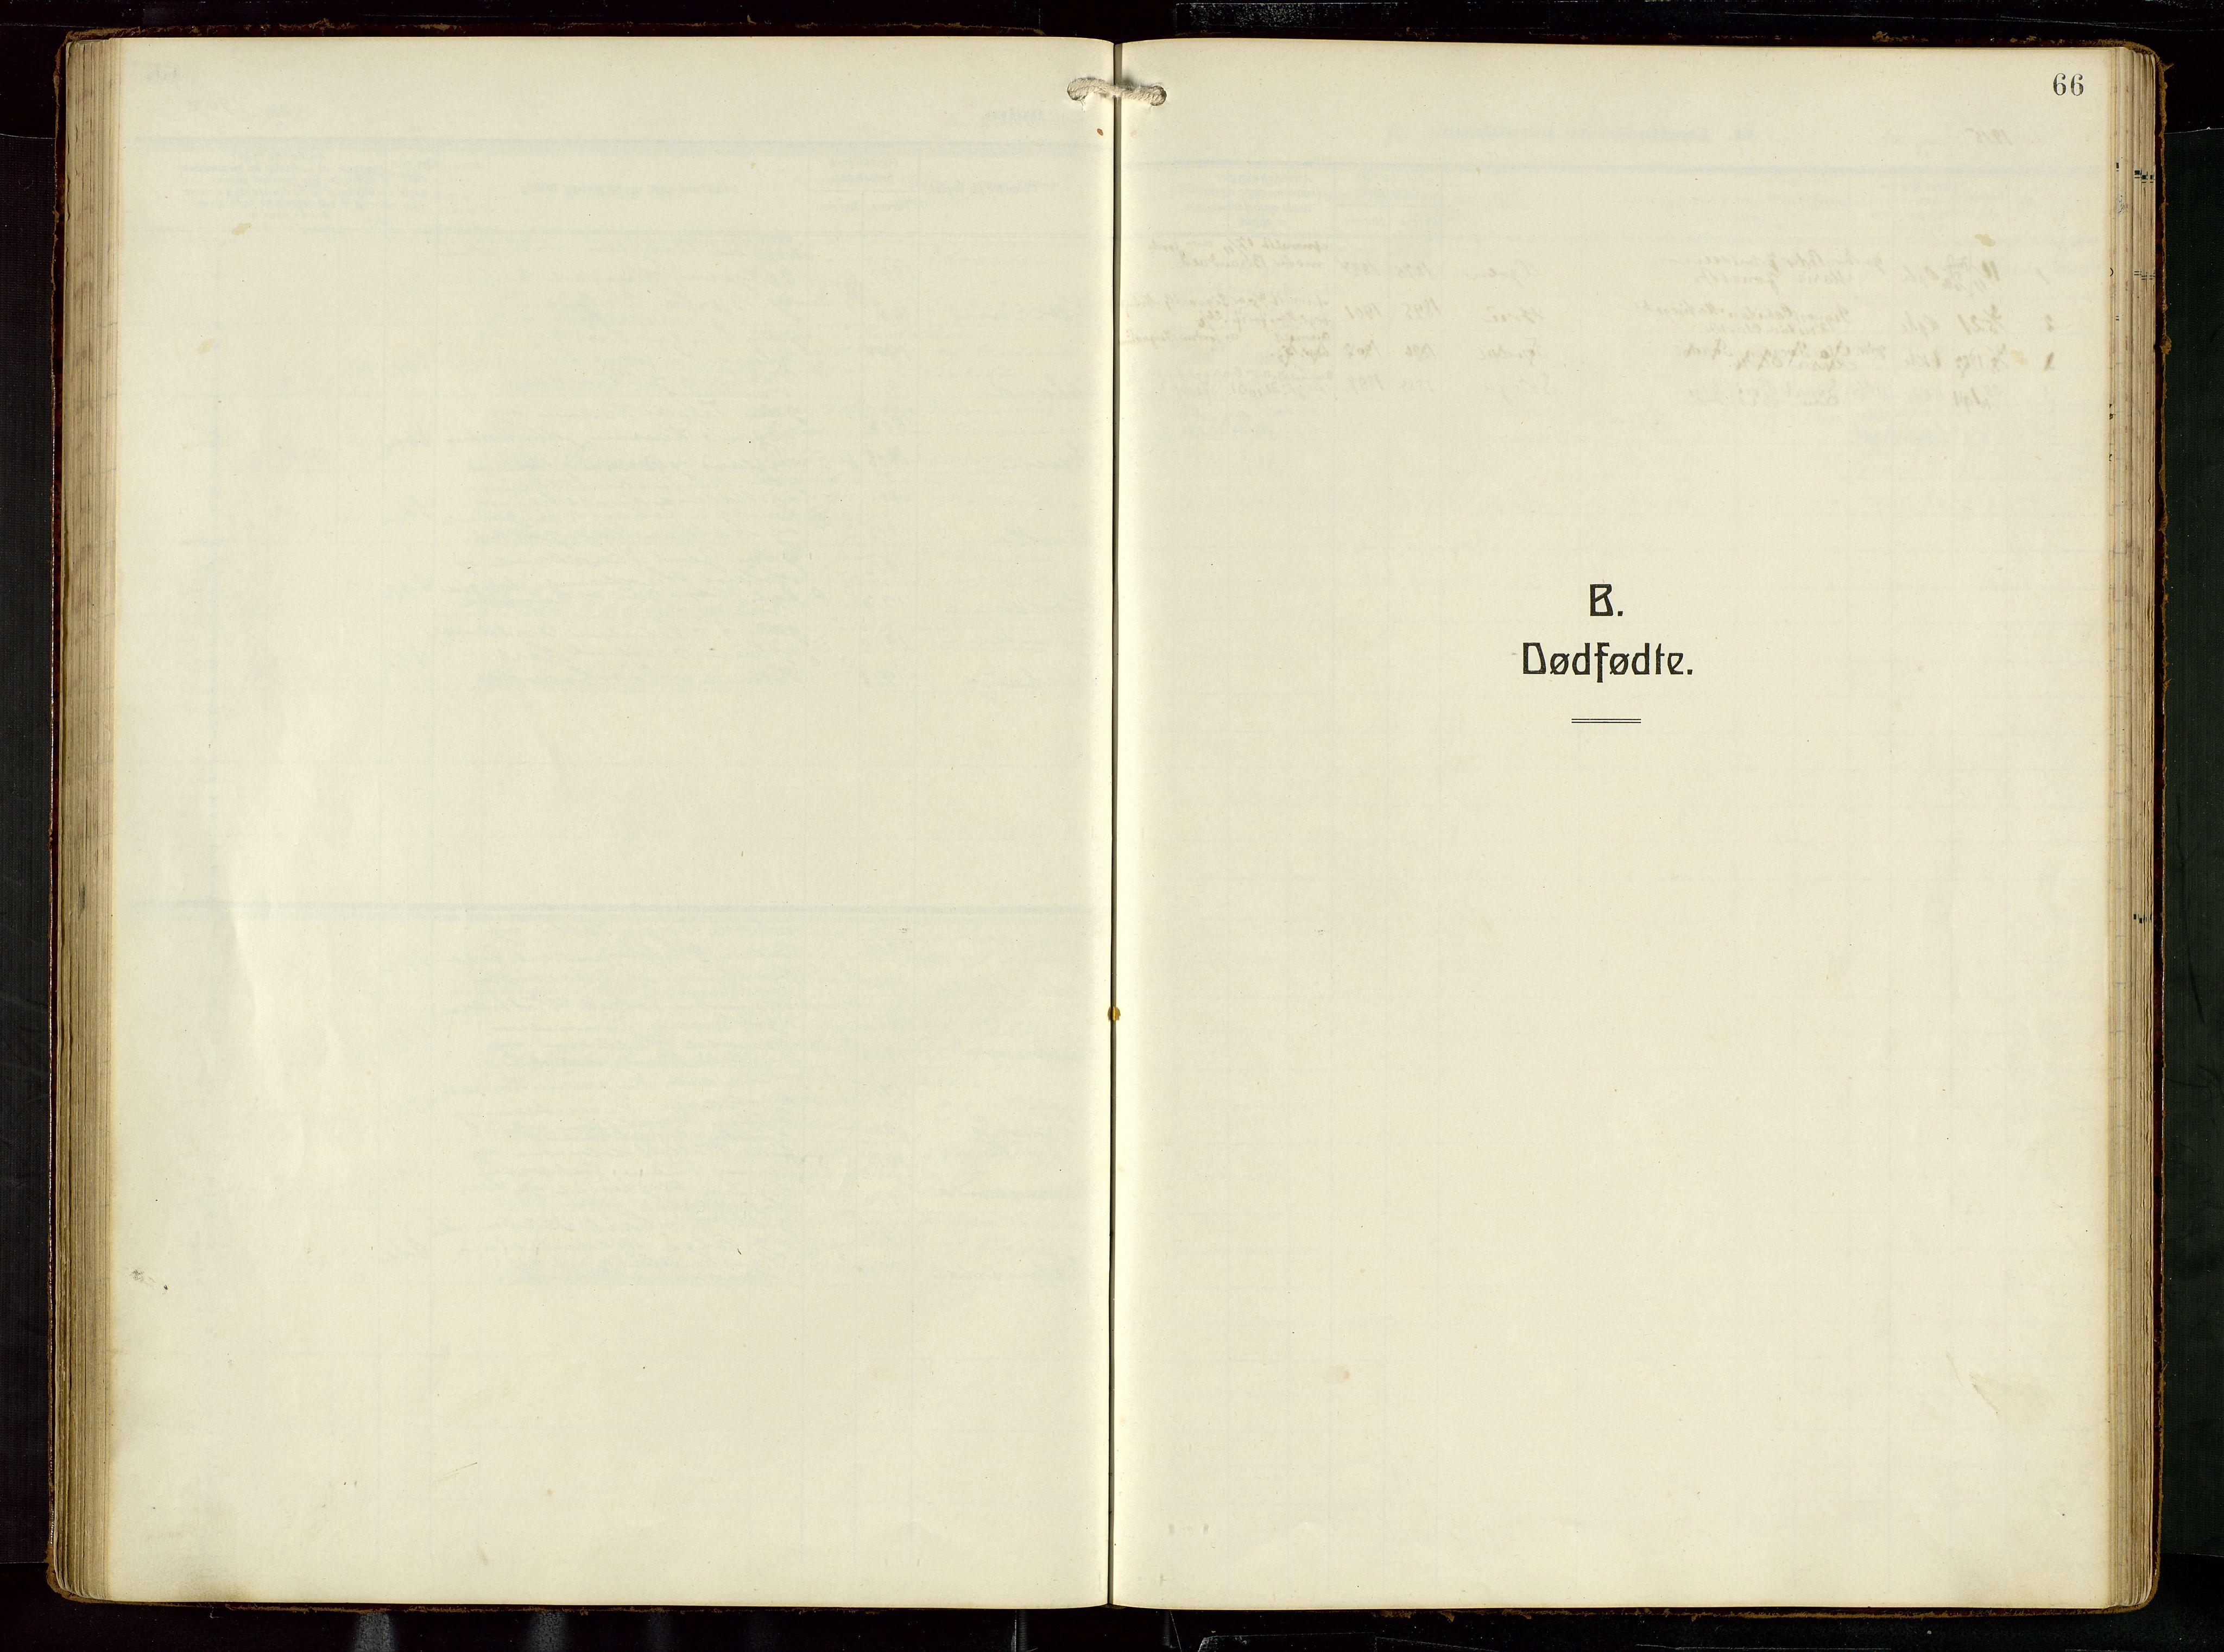 SAST, Egersund sokneprestkontor, Klokkerbok nr. B 22, 1915-1947, s. 66